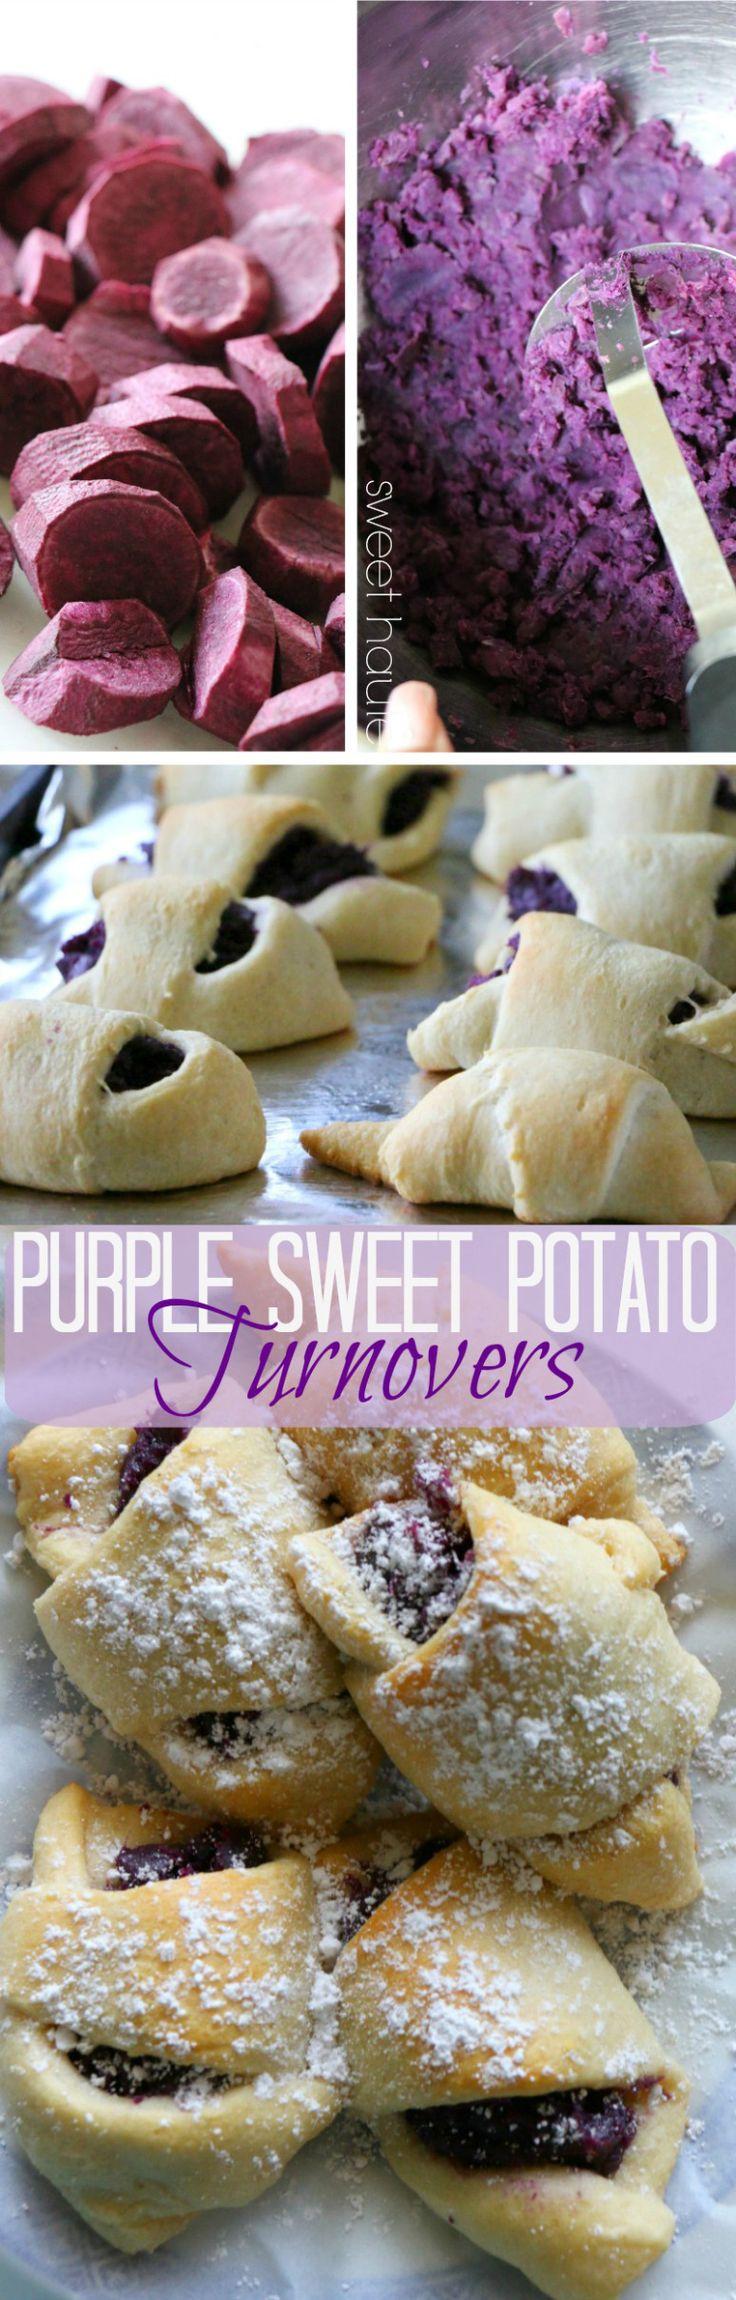 Purple Sweet Potato Turnovers- SWEET HAUTE Benimo Ube Recipe